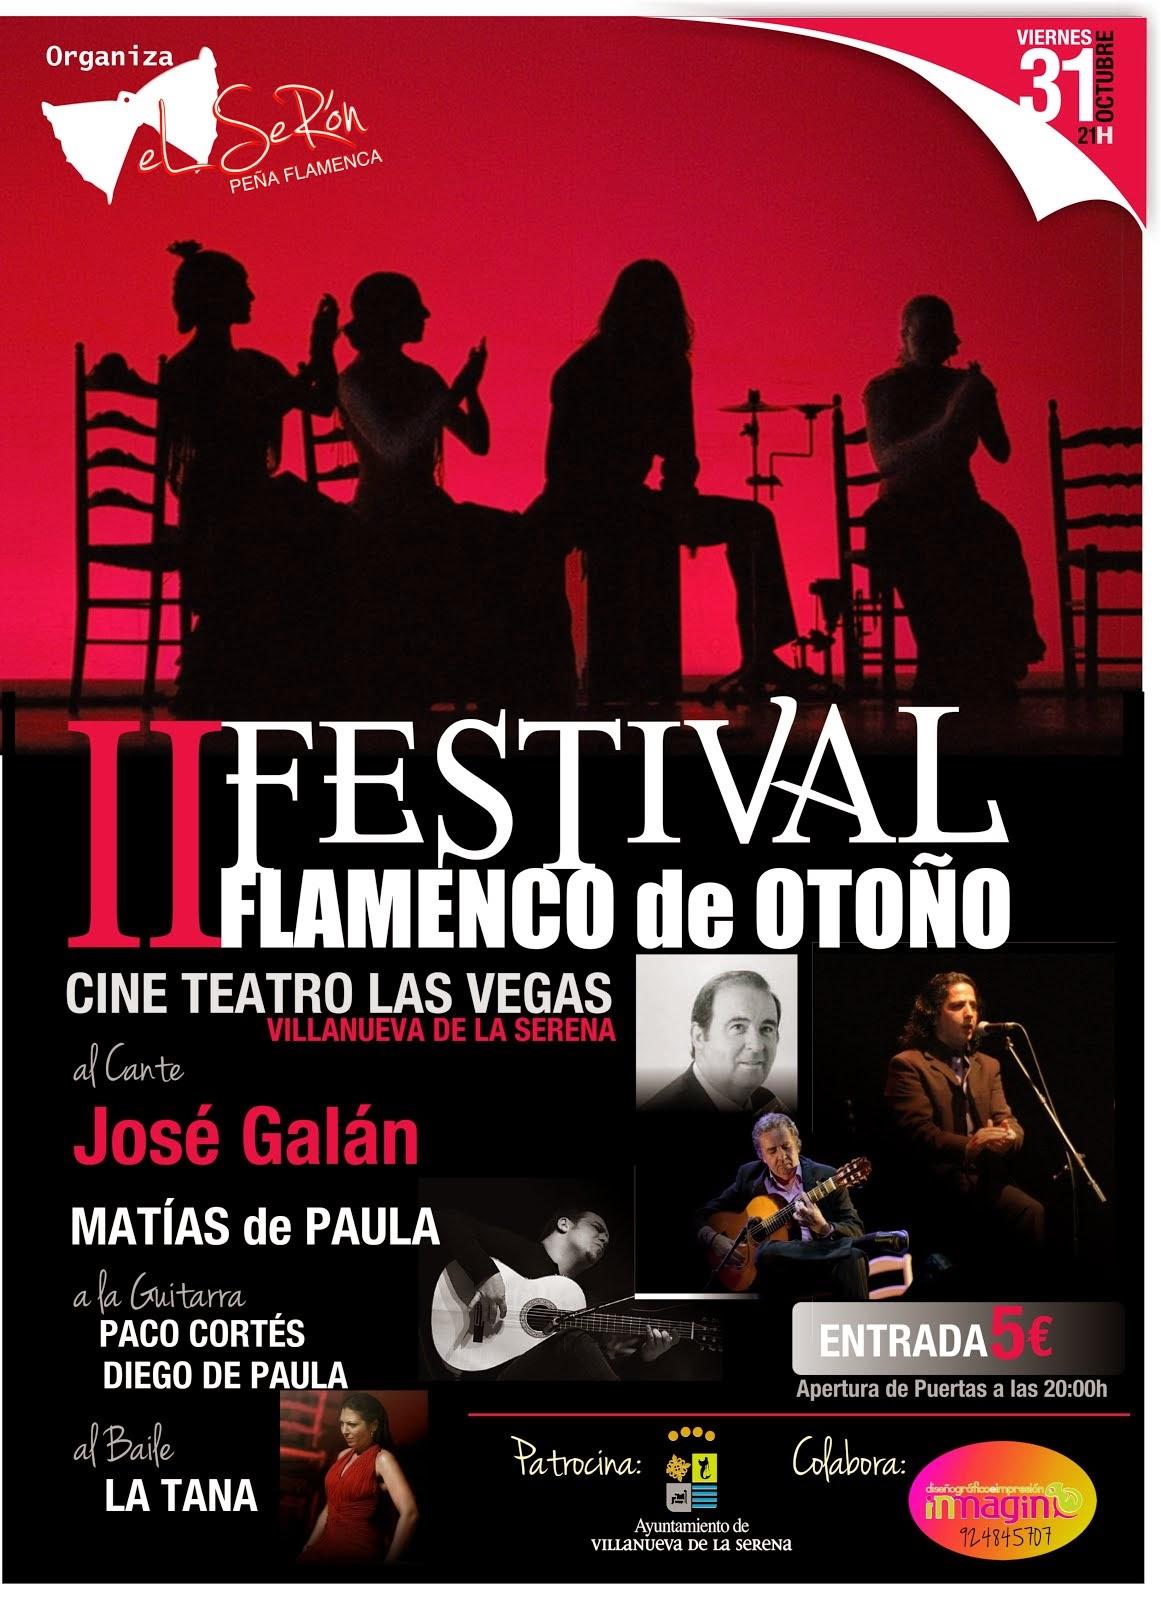 Festival Flamenco de Otoño